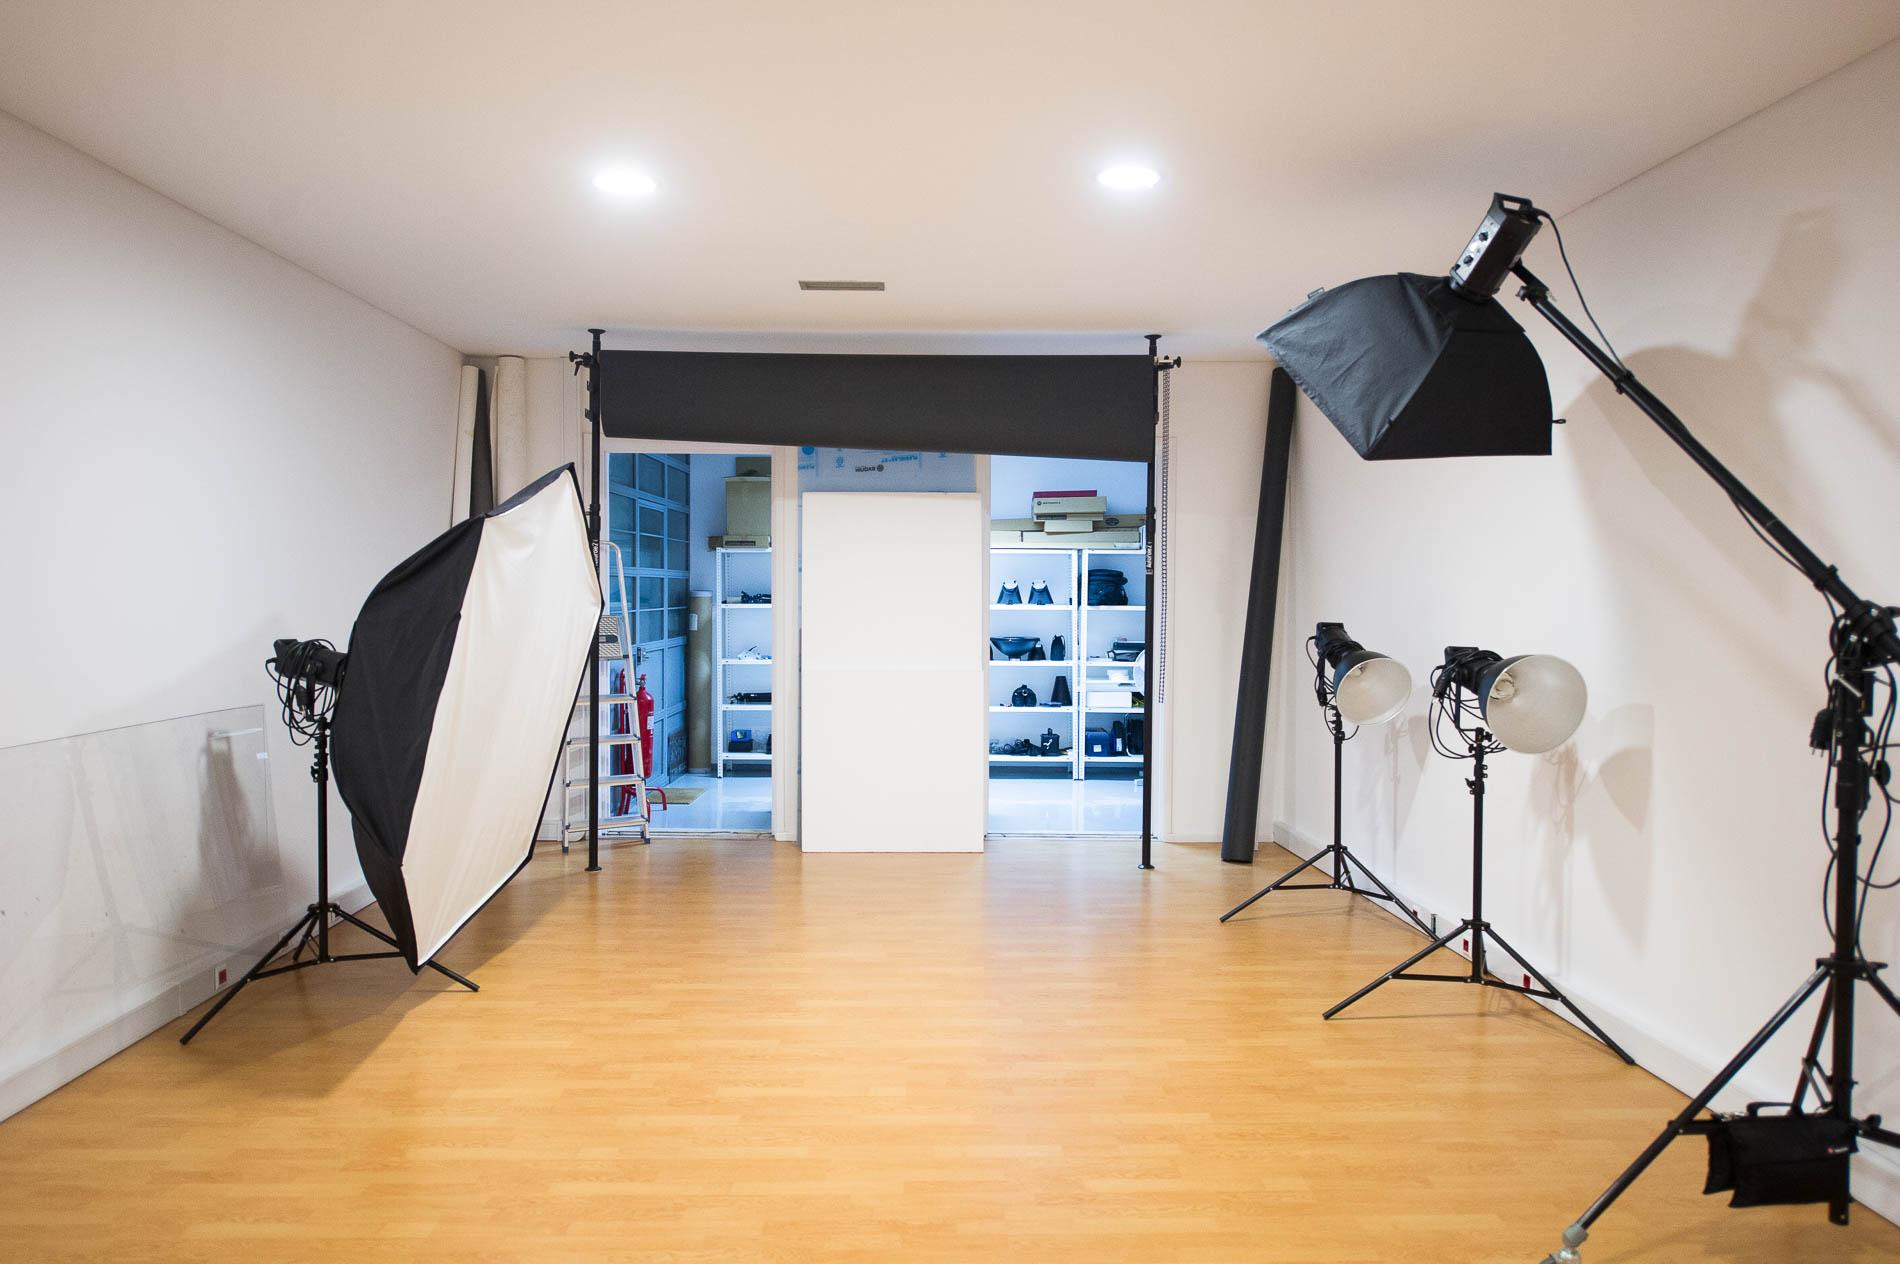 alugar estúdio de fotografia lisboa